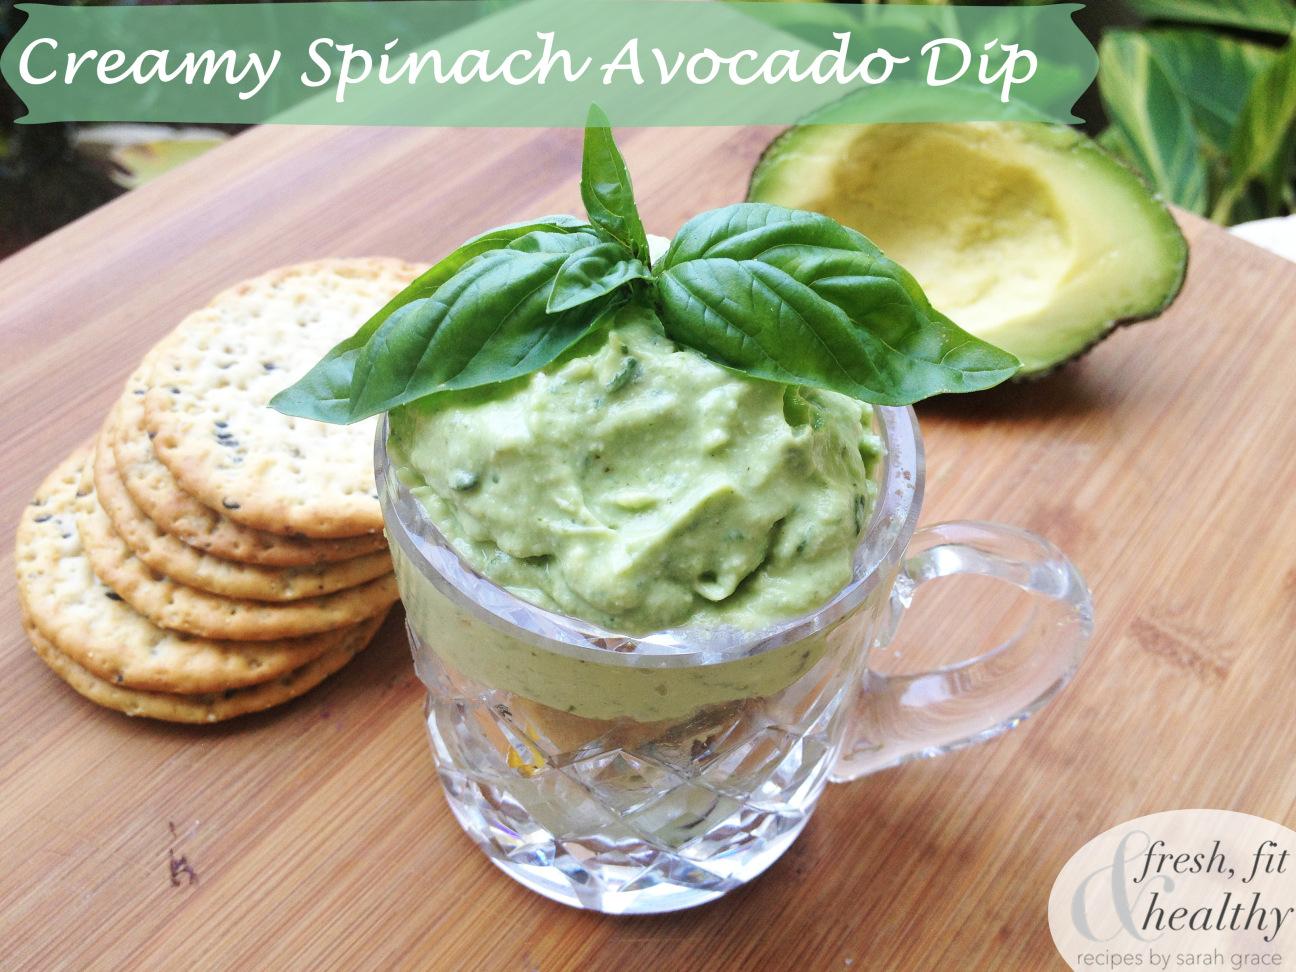 Cream Dill Veggie Dip Creamy Avocado Spinach Dip Fresh and Healthy ...